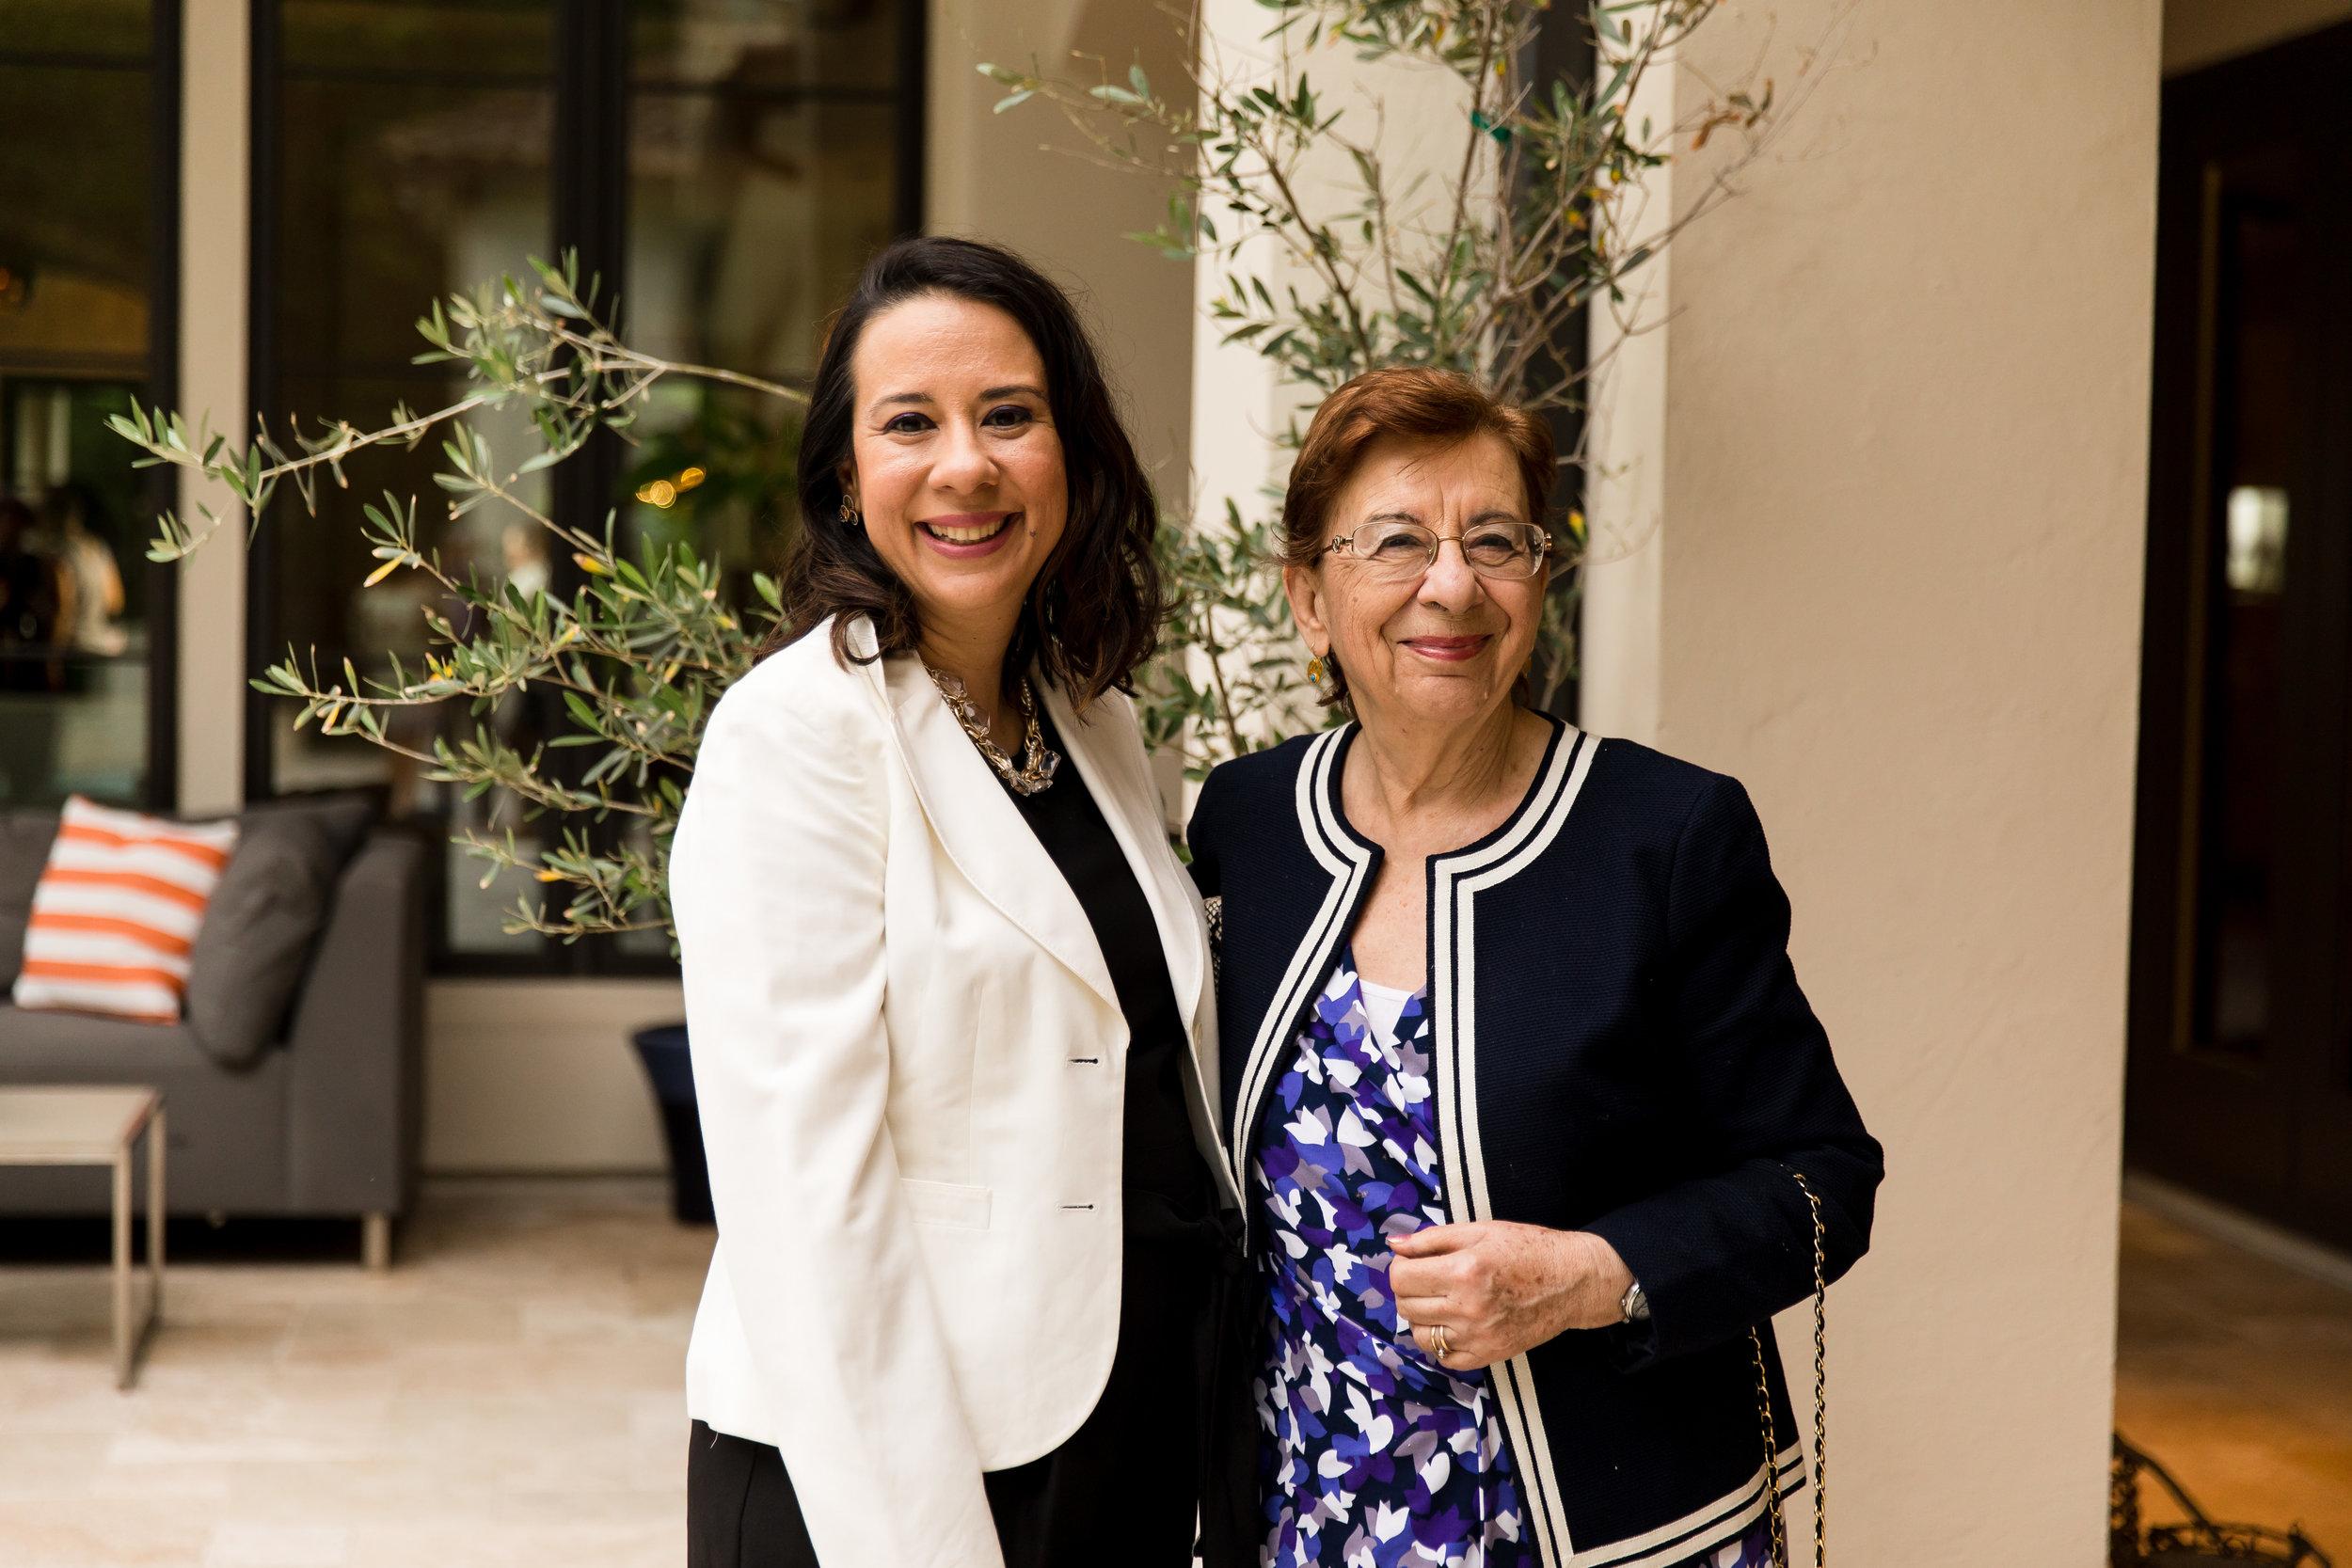 20180421-3rd Annual Education Women Turkey-130.jpg